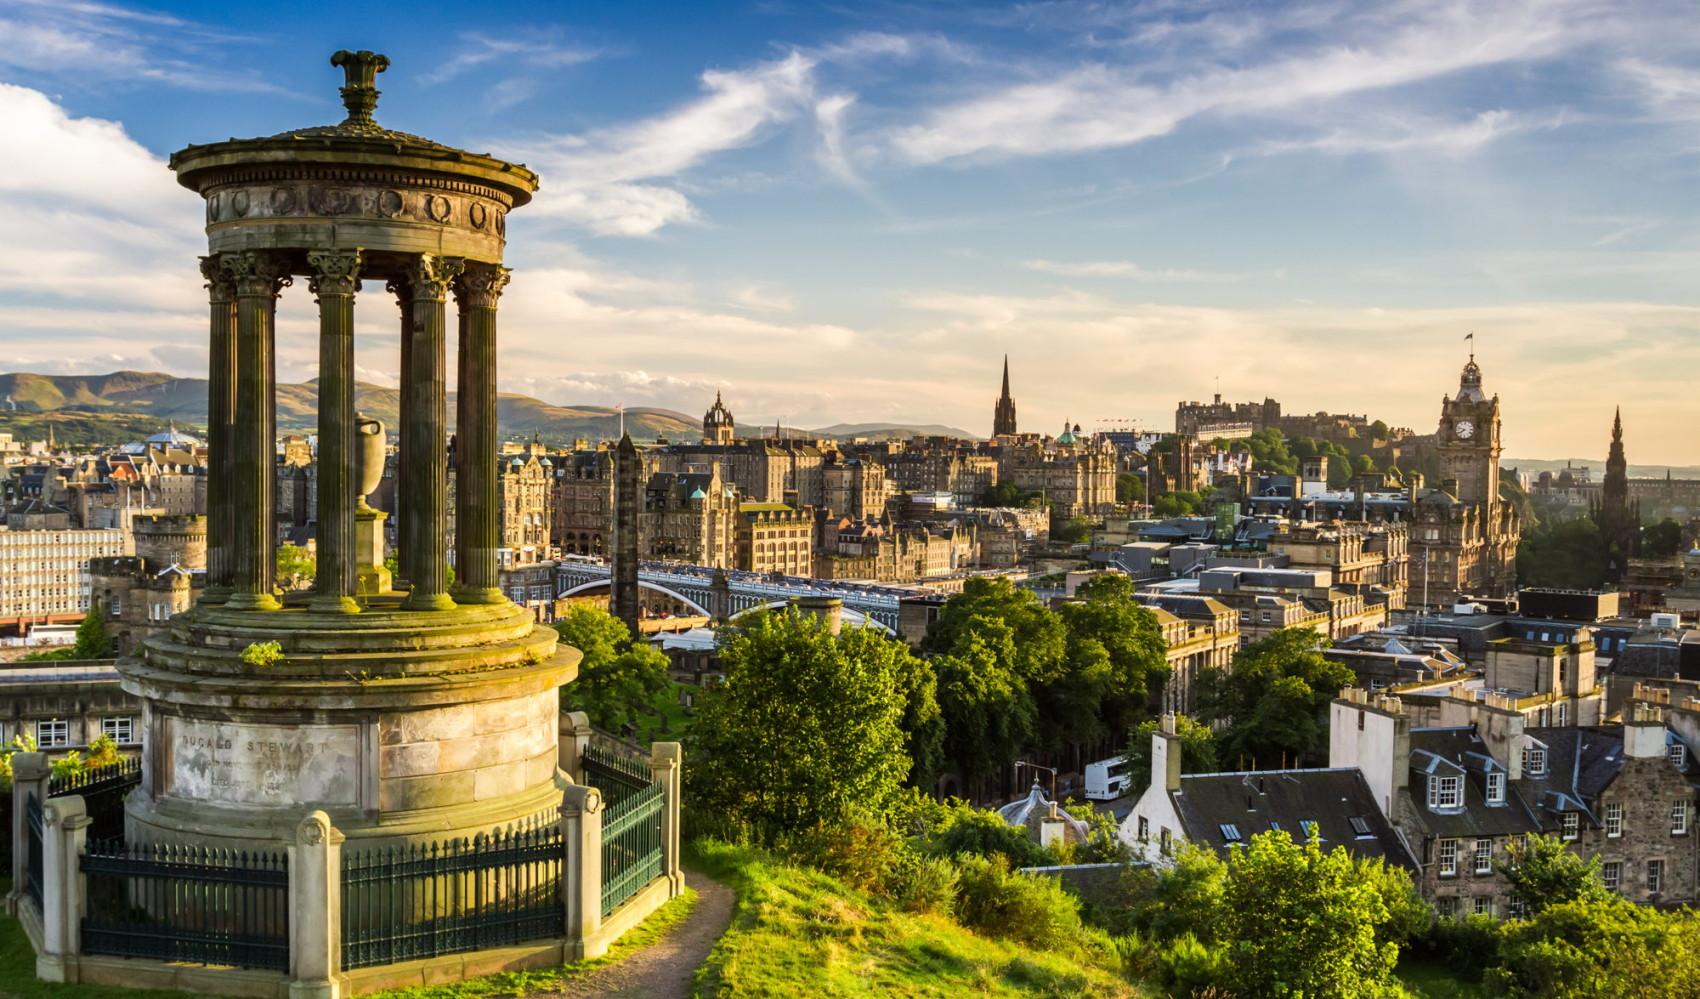 Edinburgh 3 Day Excursion